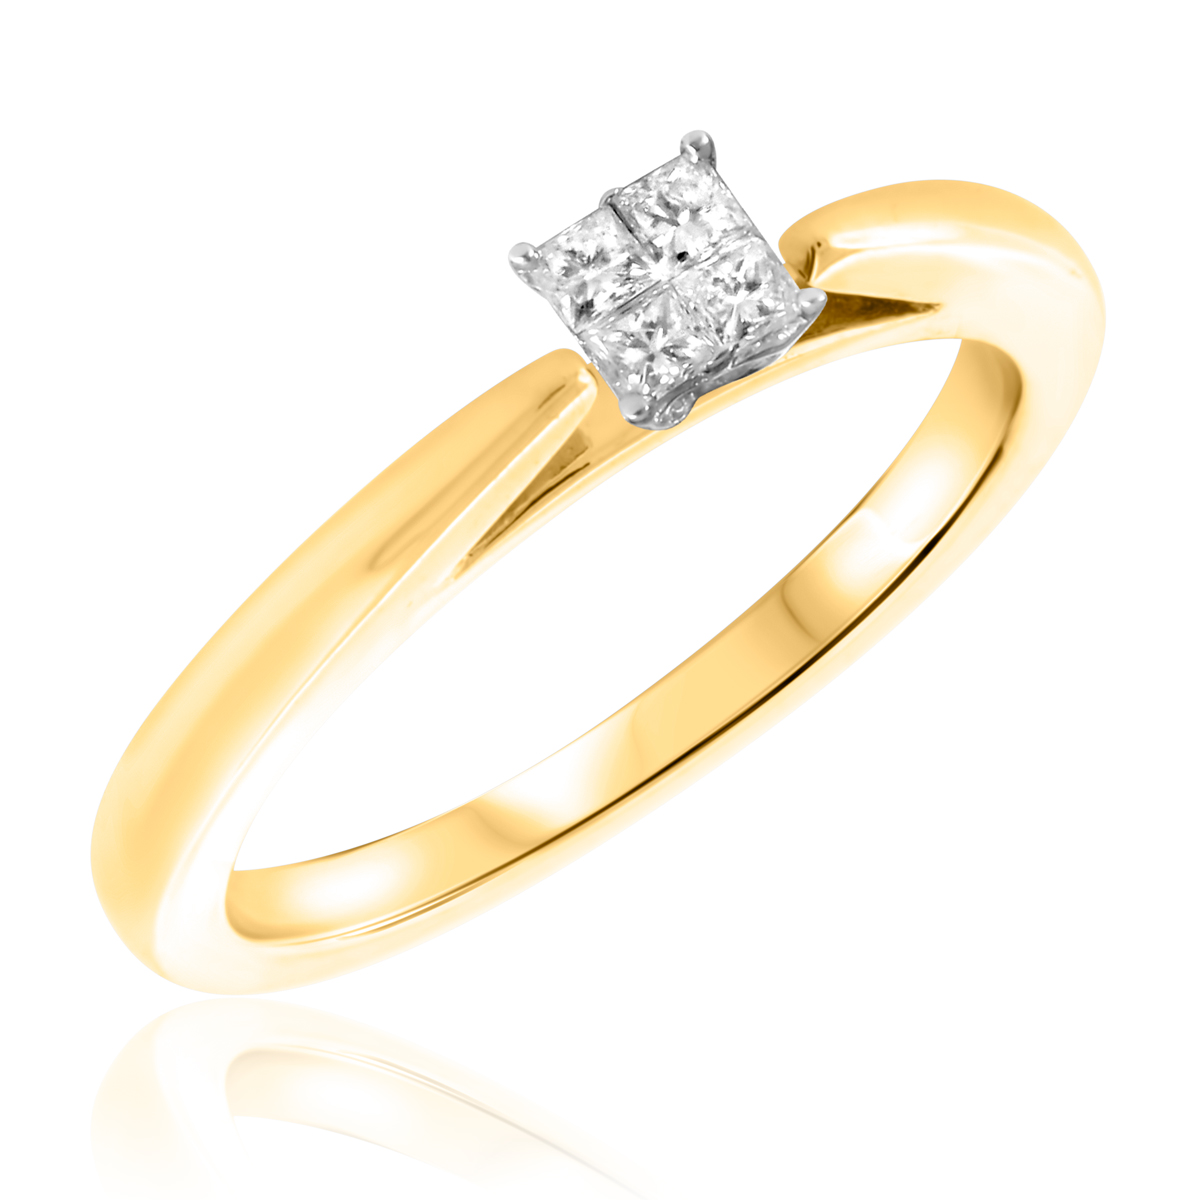 1/4 CT. T.W. Diamond Ladies Engagement Ring 10K Yellow Gold- Size 8